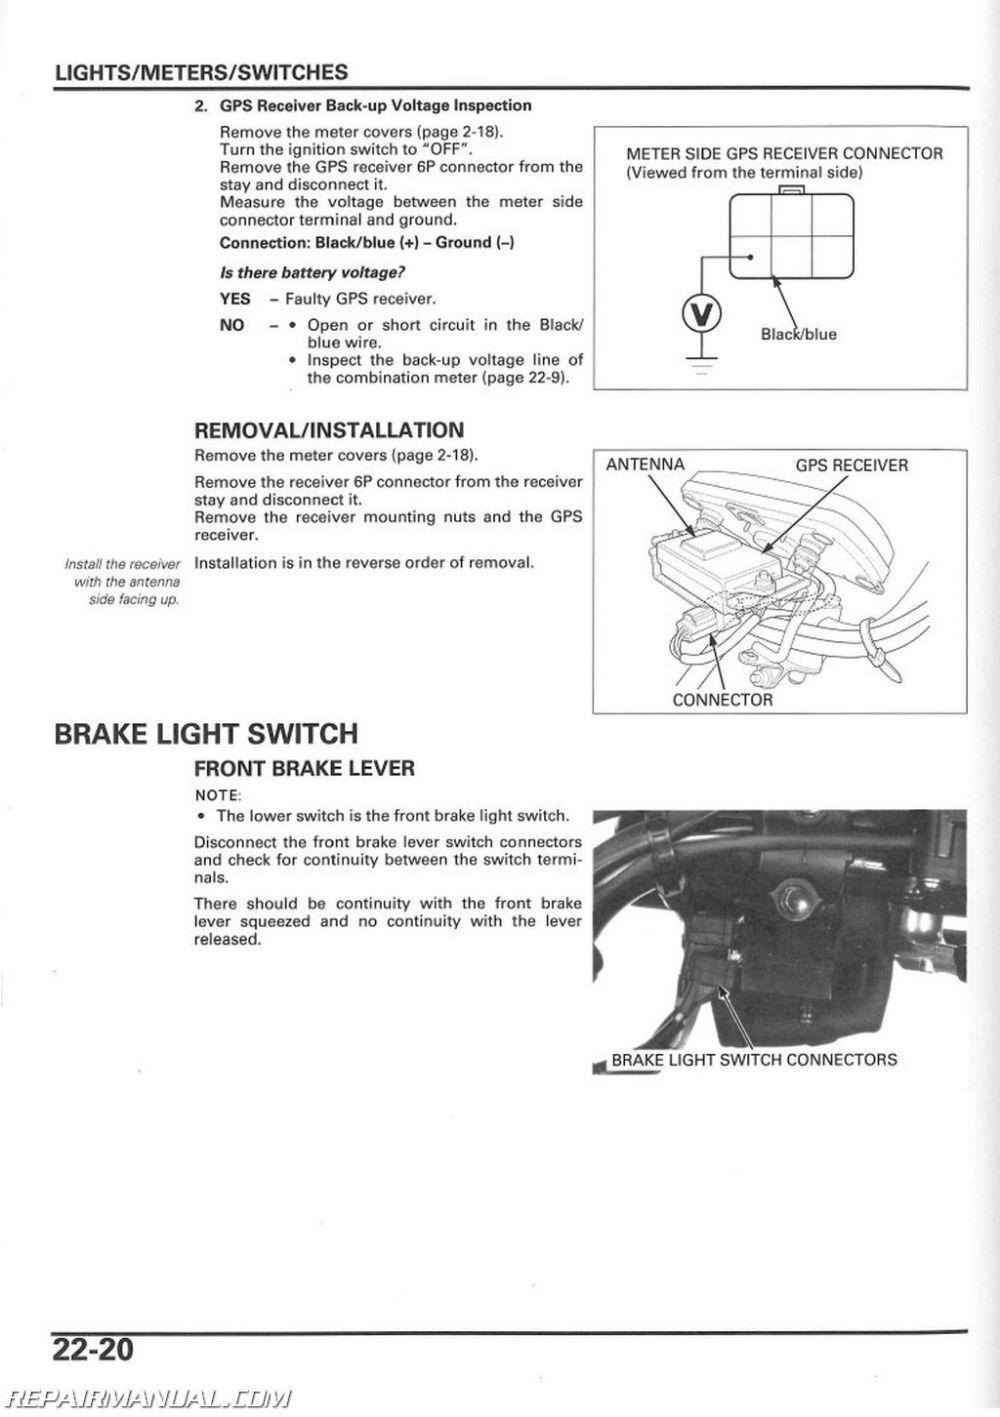 medium resolution of 2003 honda rincon 650 wiring diagram